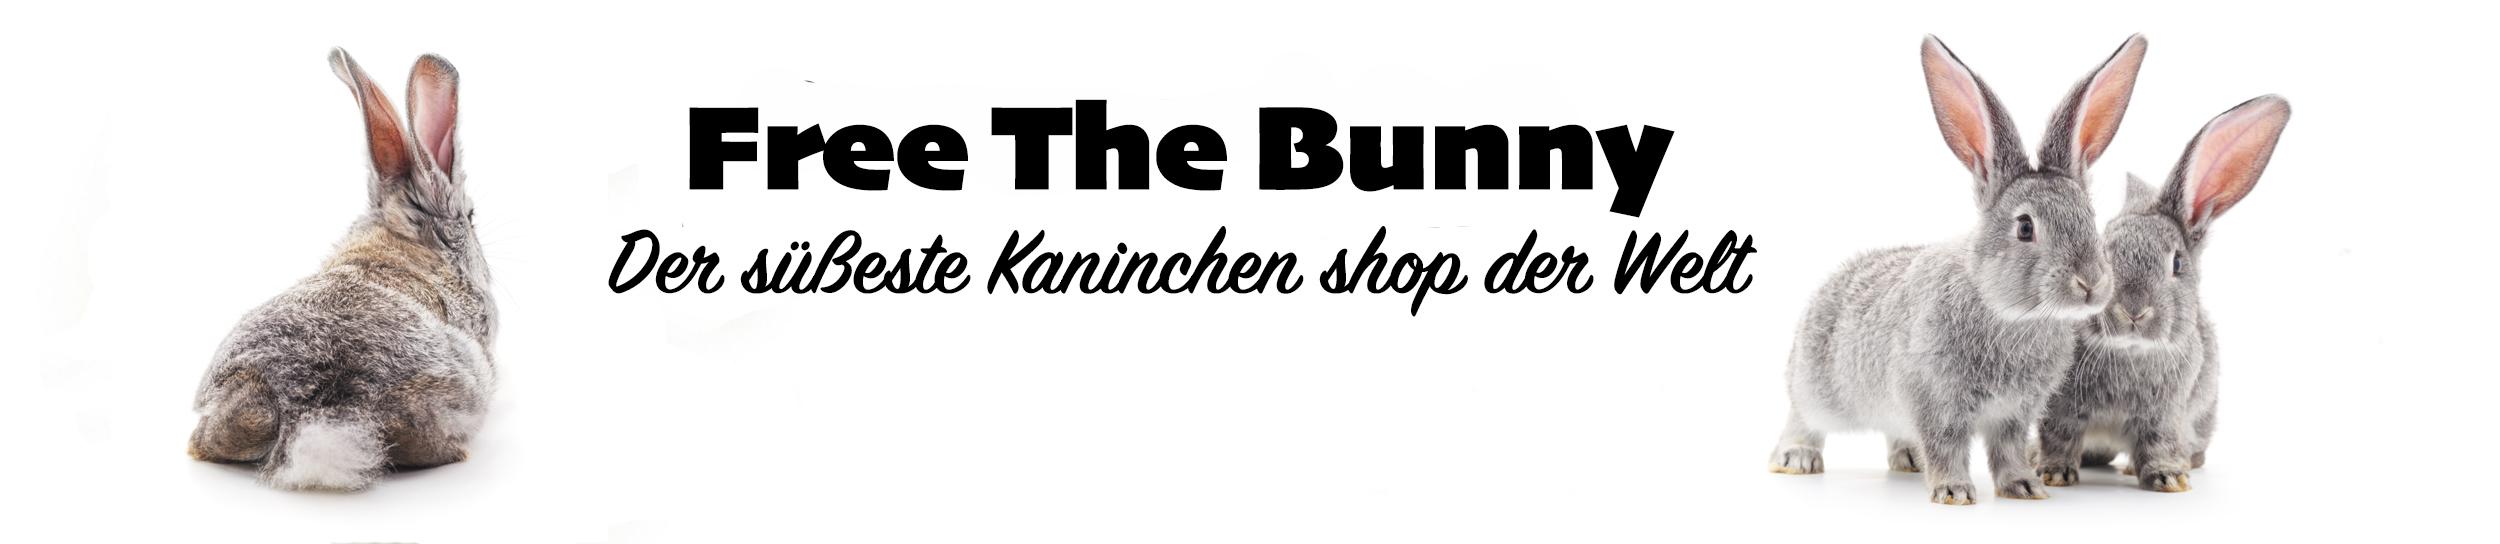 free the bunny banner de